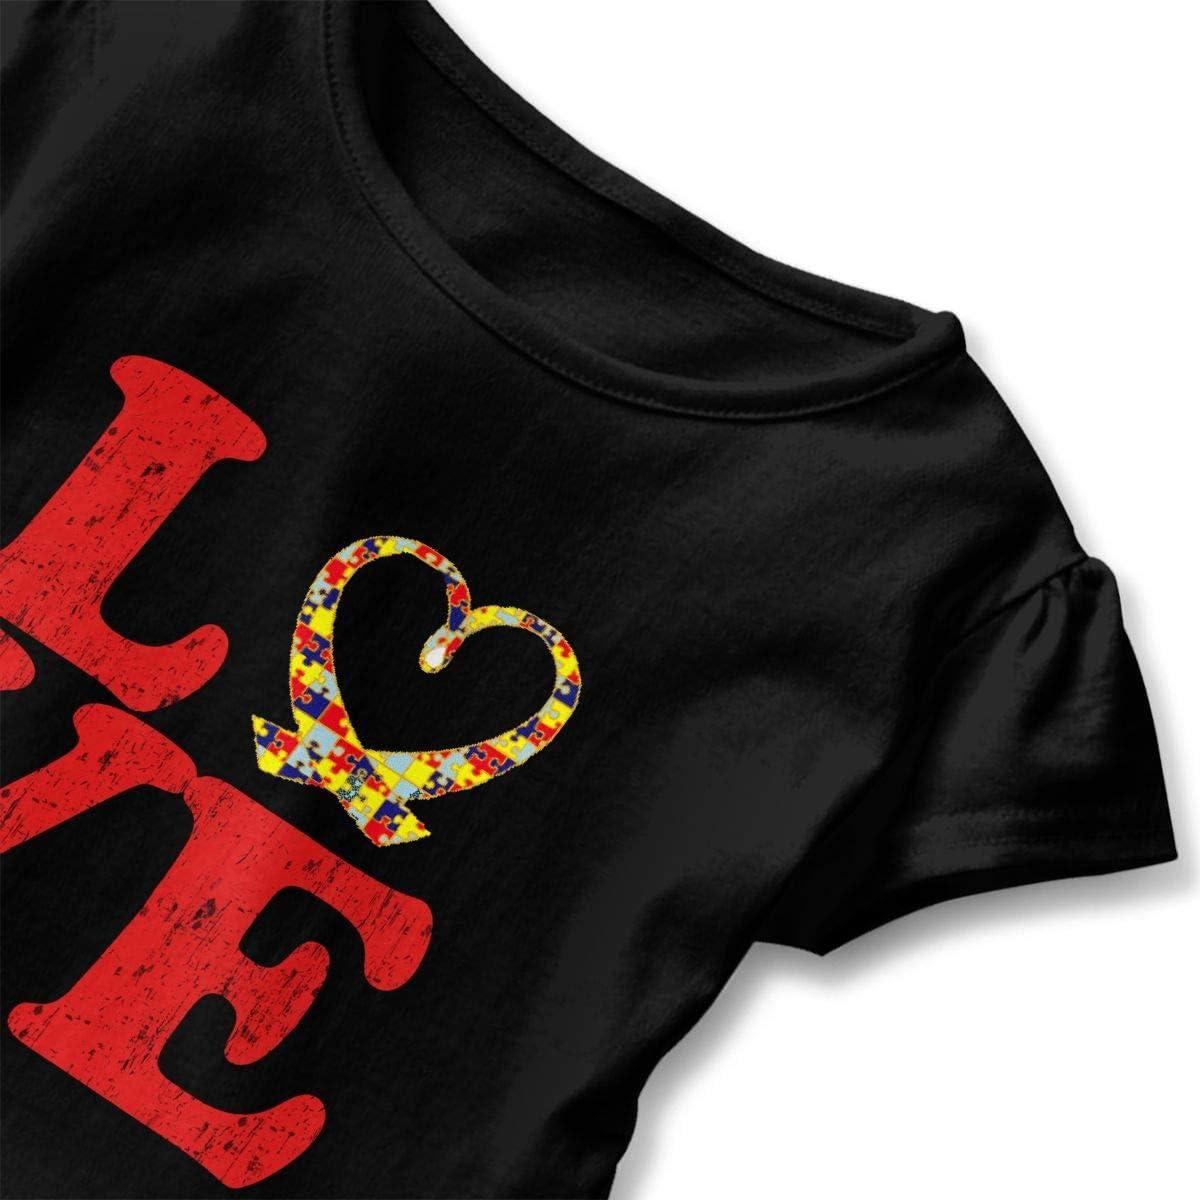 Cheng Jian Bo Autism Awareness Heart Toddler Girls T Shirt Kids Cotton Short Sleeve Ruffle Tee